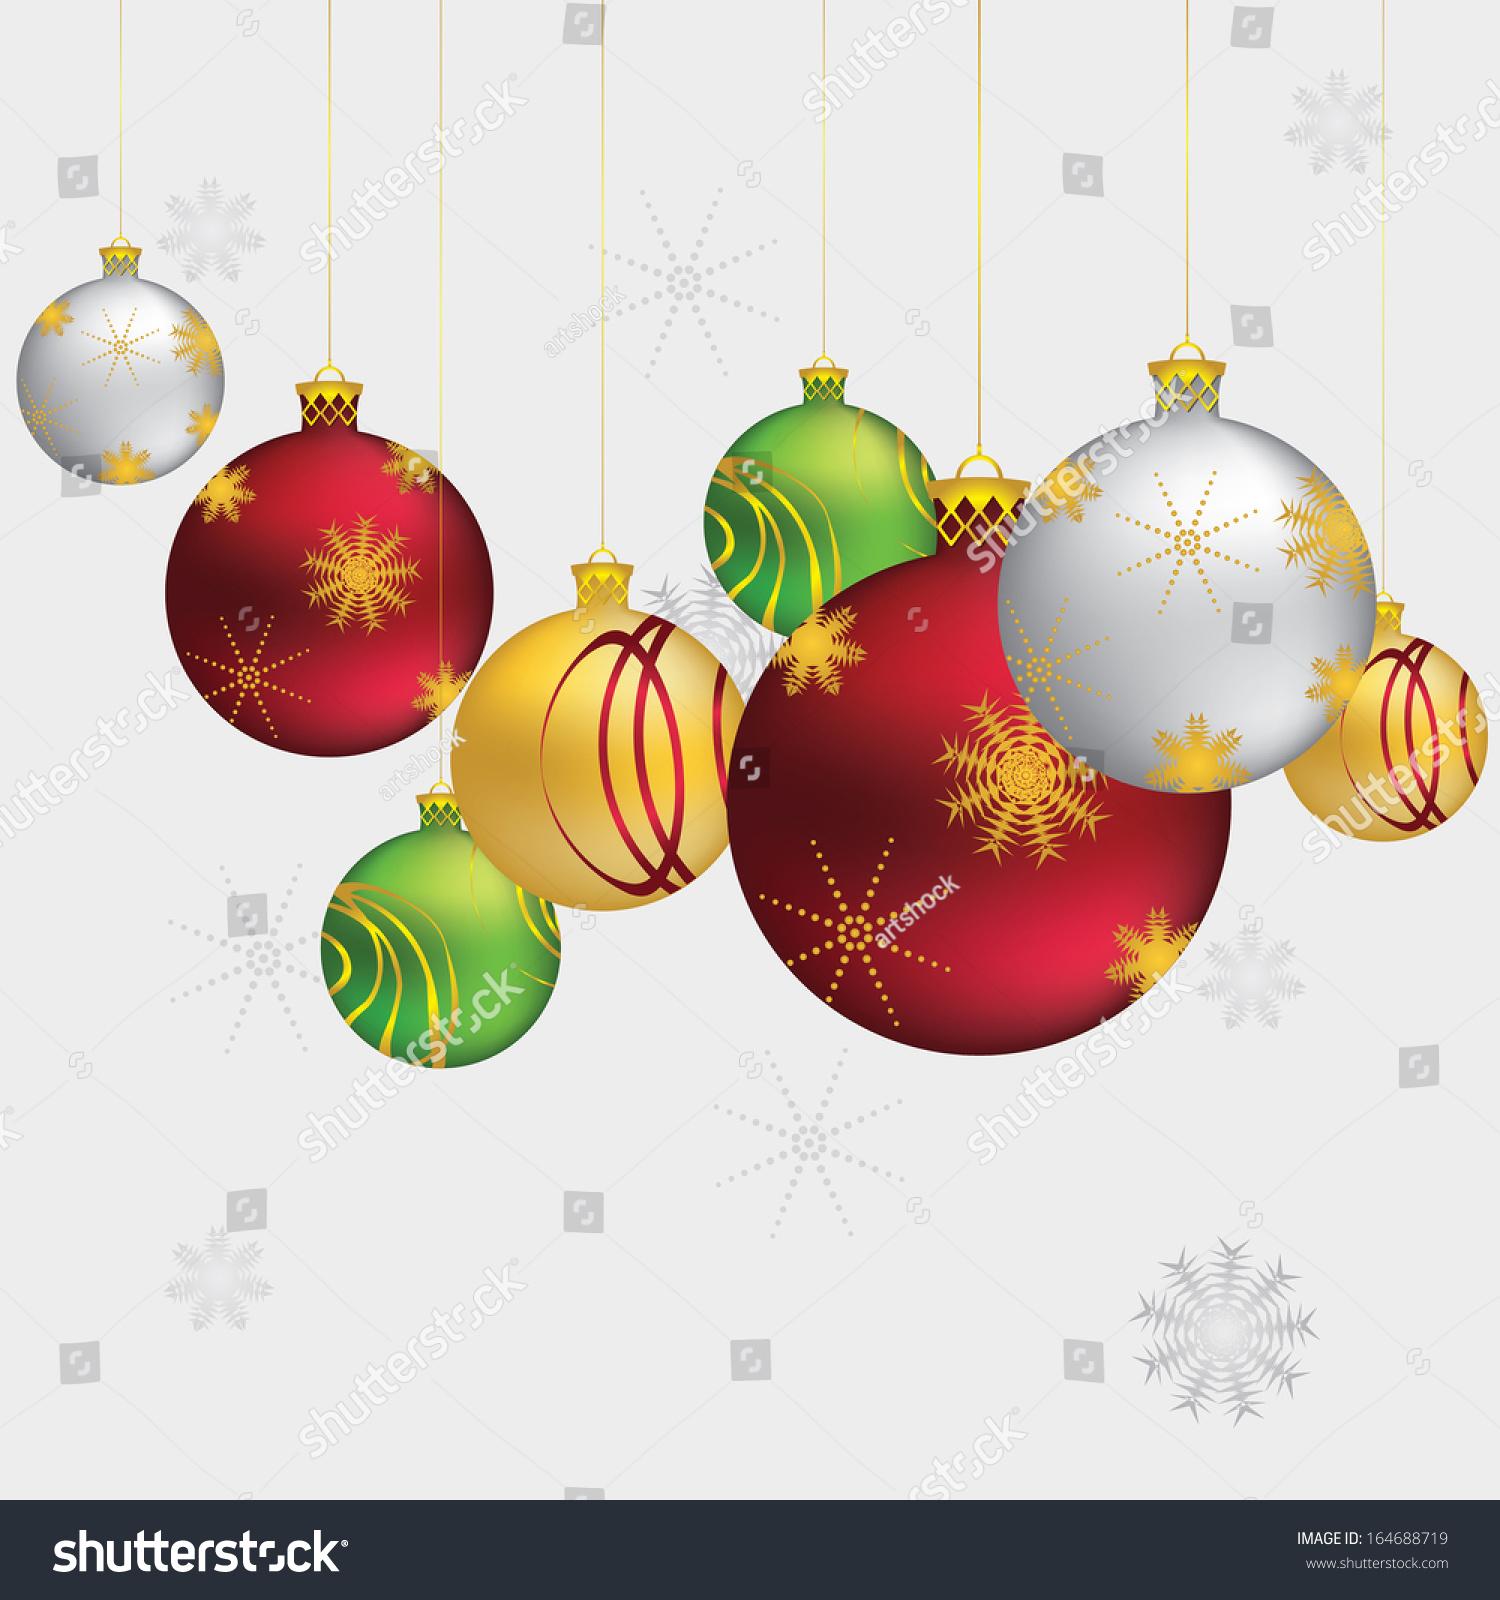 Beautiful Christmas Balls, Decorative Ornaments On Grey ...